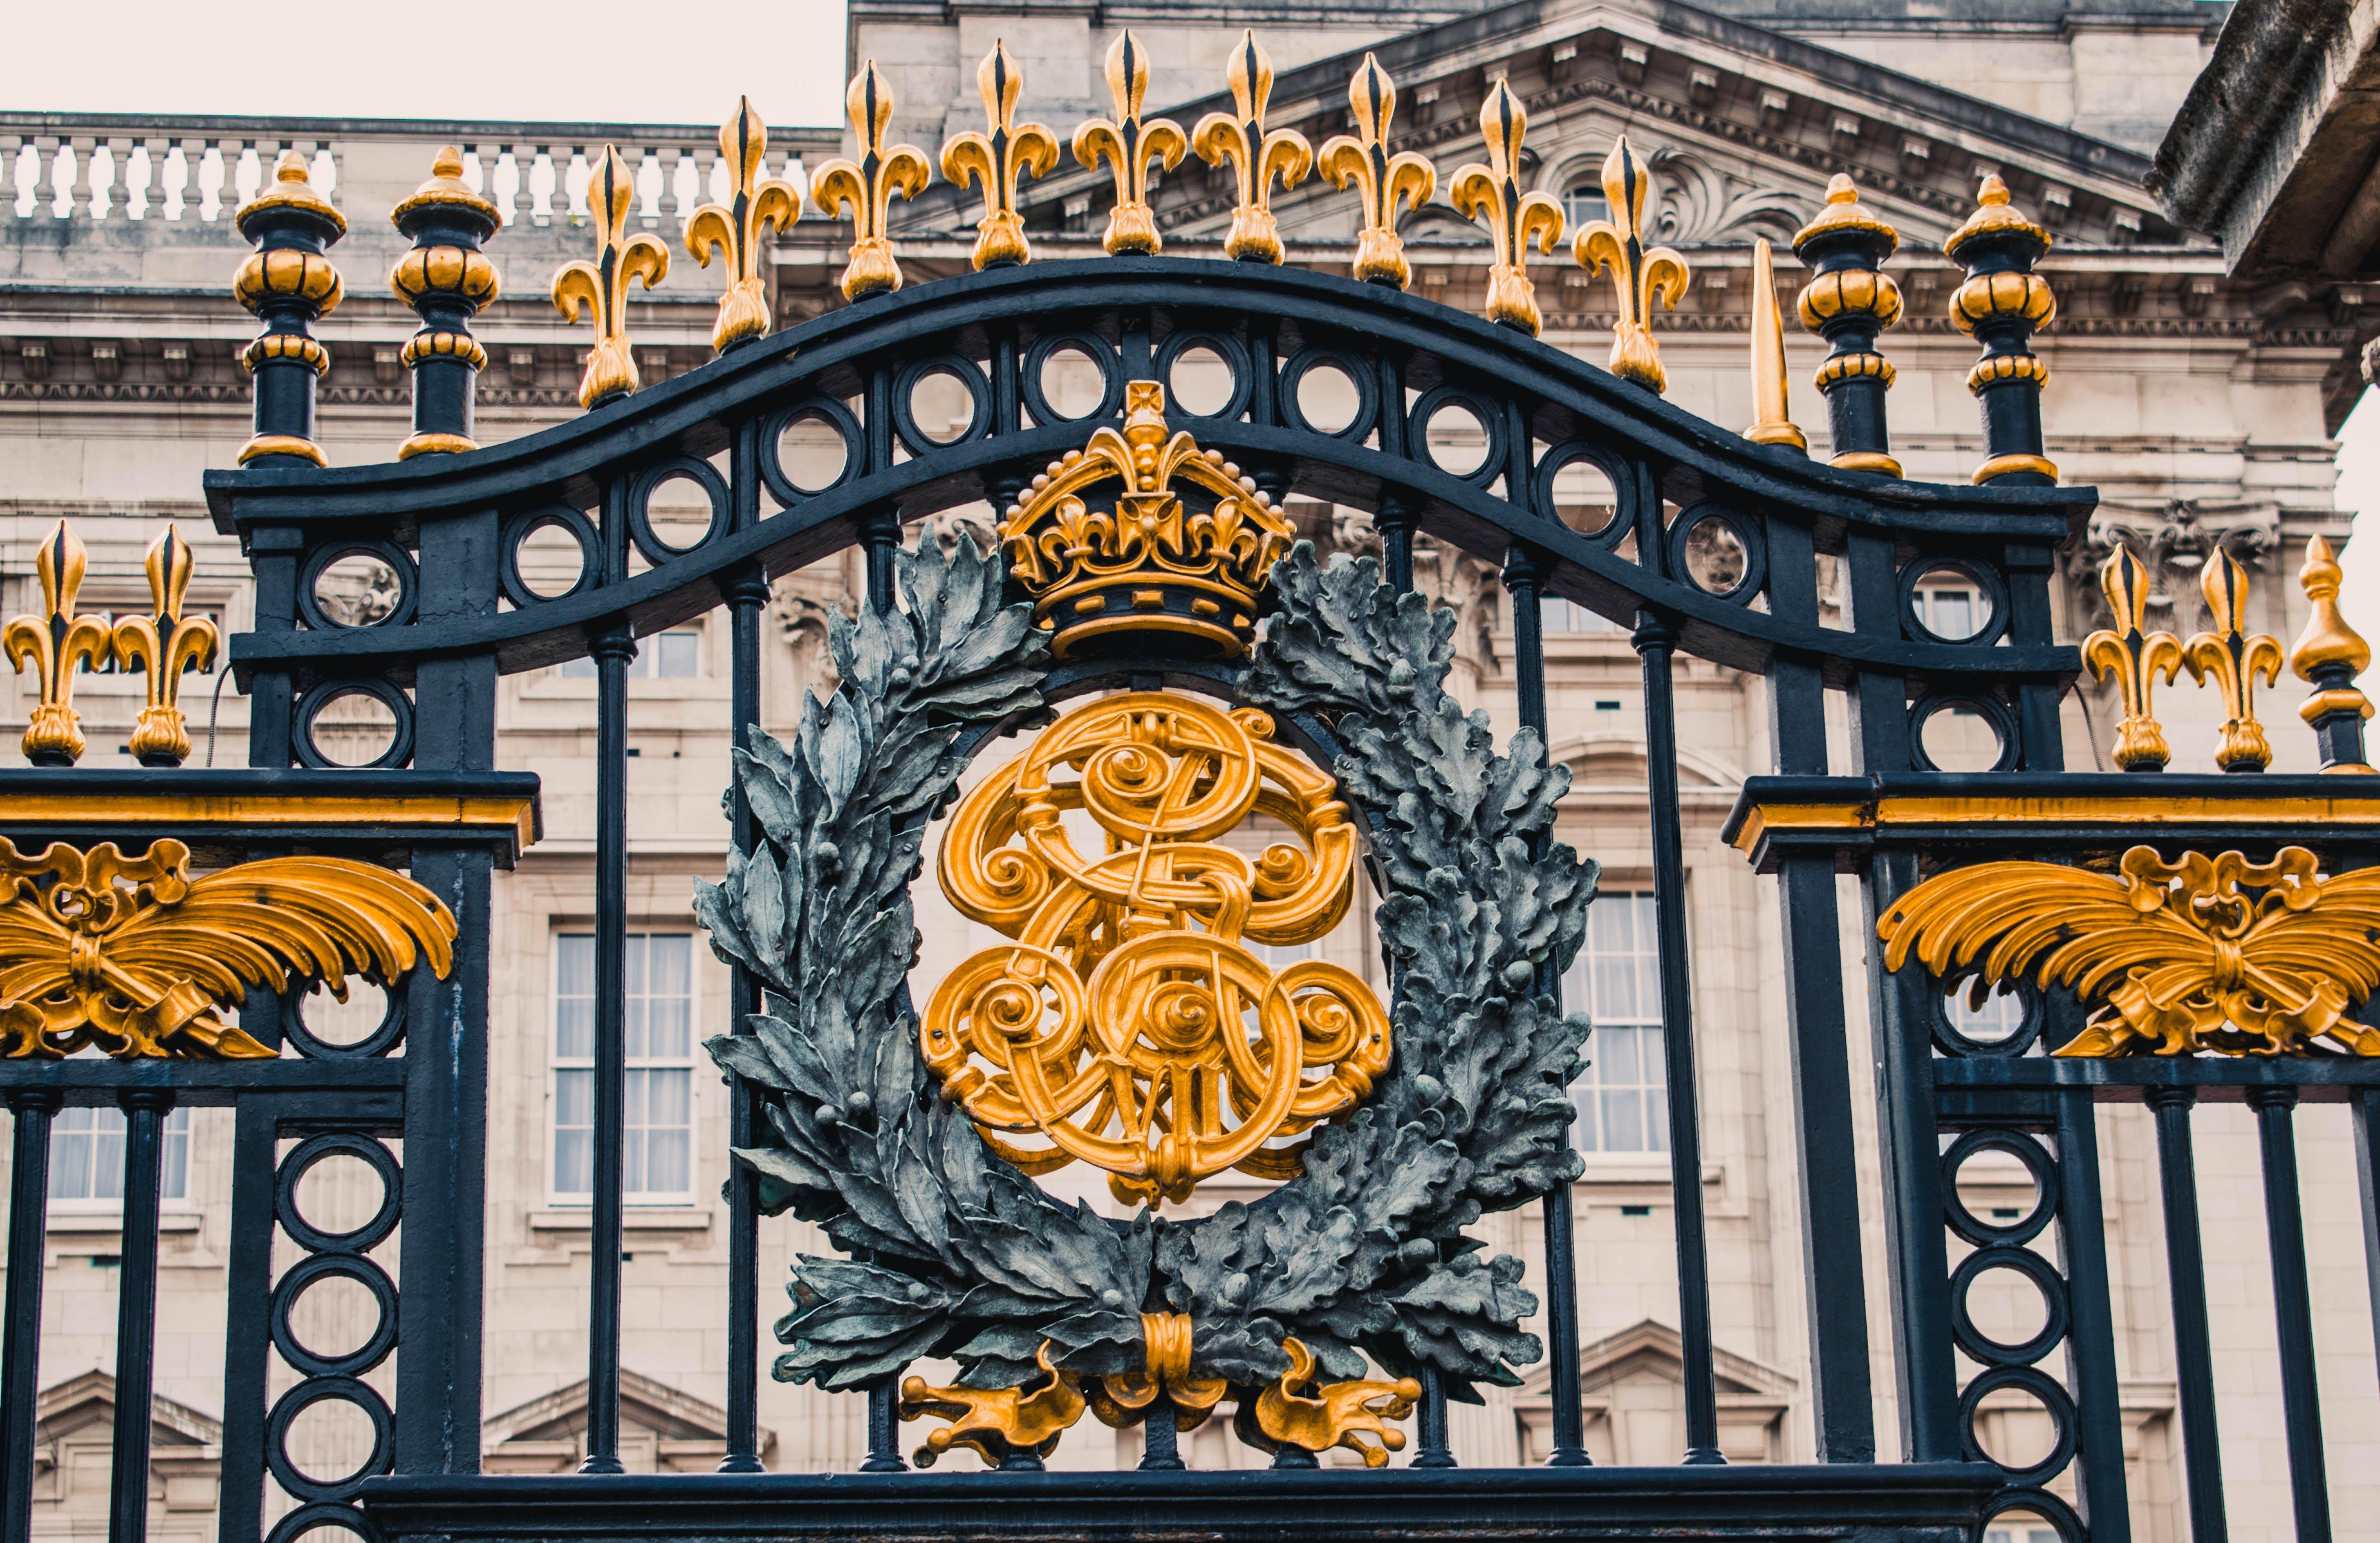 Close-Up of Gate of Buckingham Palace